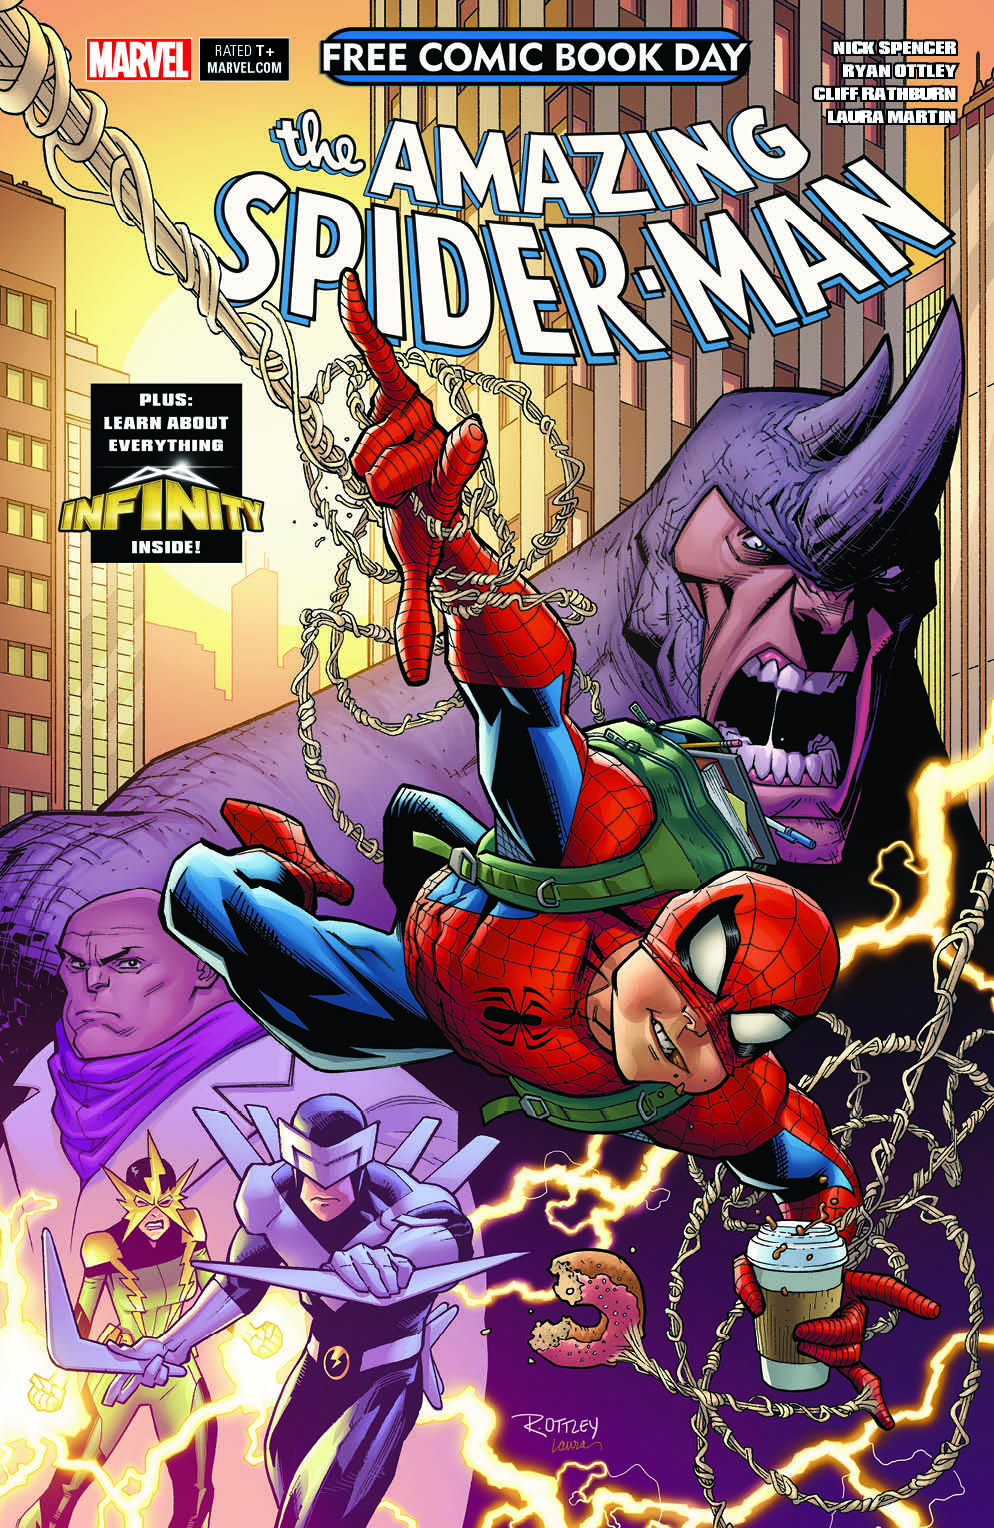 The Amazing Spiderman FCBD 2018